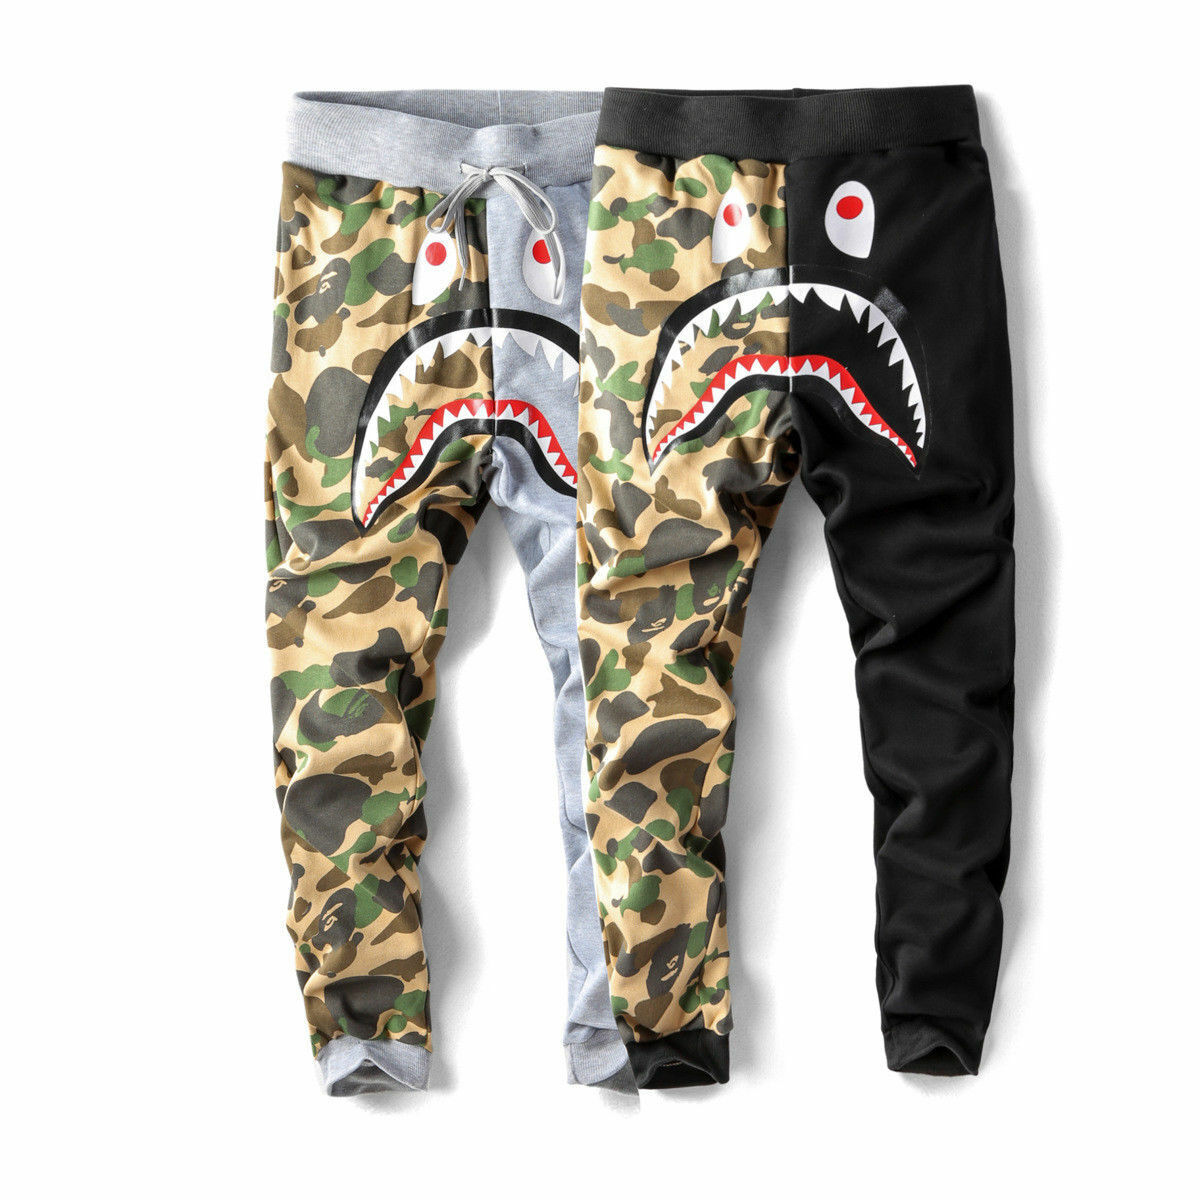 *Japan BAPE A Bathing Ape Shark Head Camo Sweatpants Men's C